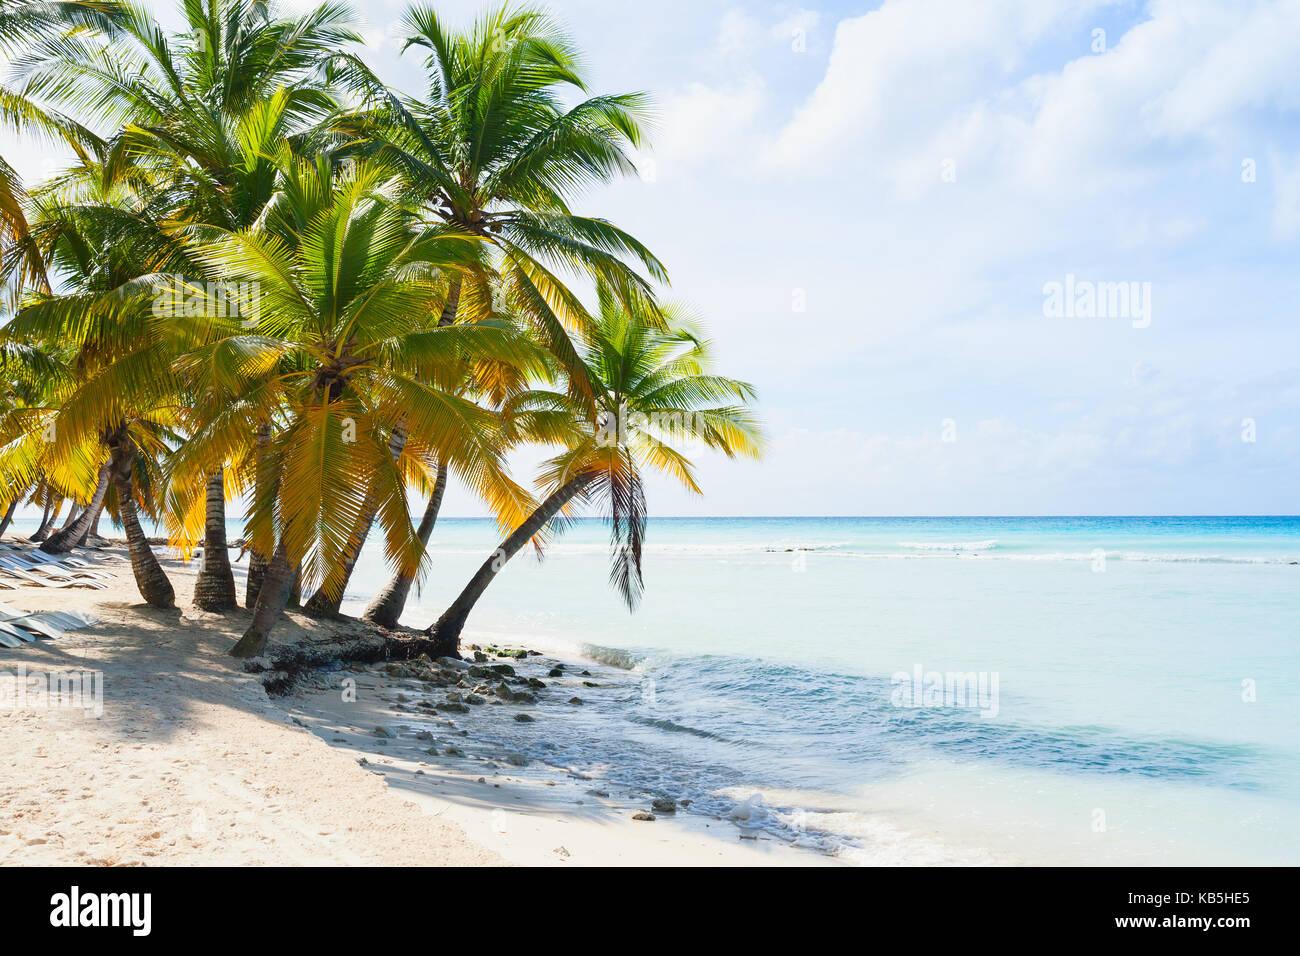 Coconut palm trees grow on white sandy beach. Caribbean Sea coast, Dominican republic, Saona island - Stock Image